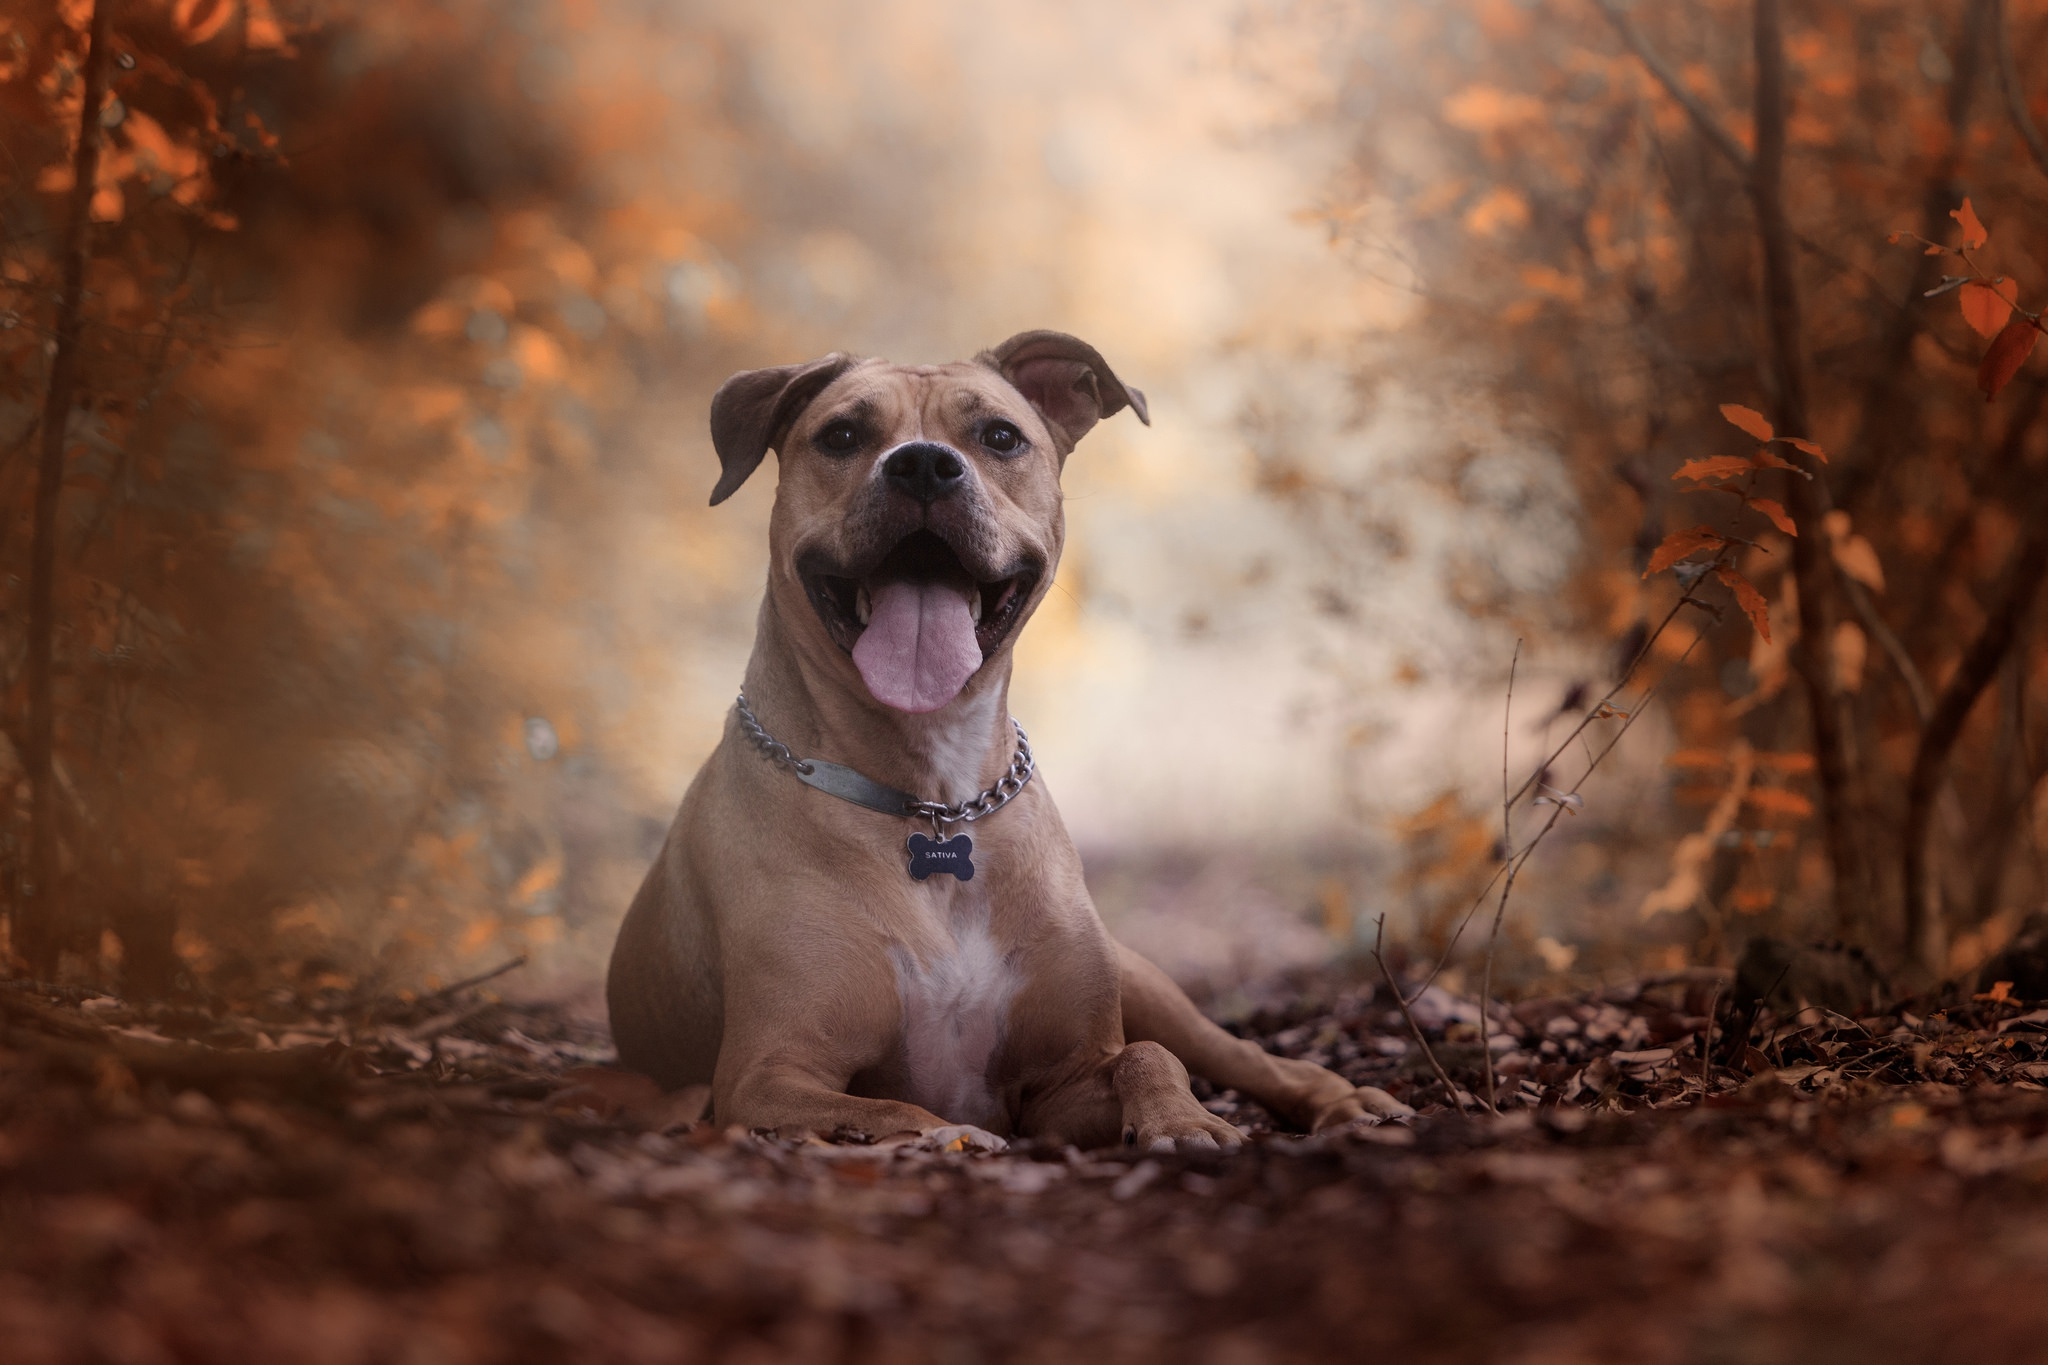 1590x1600 blue nose pitbull wallpaper hd pit bull dog hd wallpaper. American Pit Bull Terrier Hd Wallpaper Background Image 2048x1365